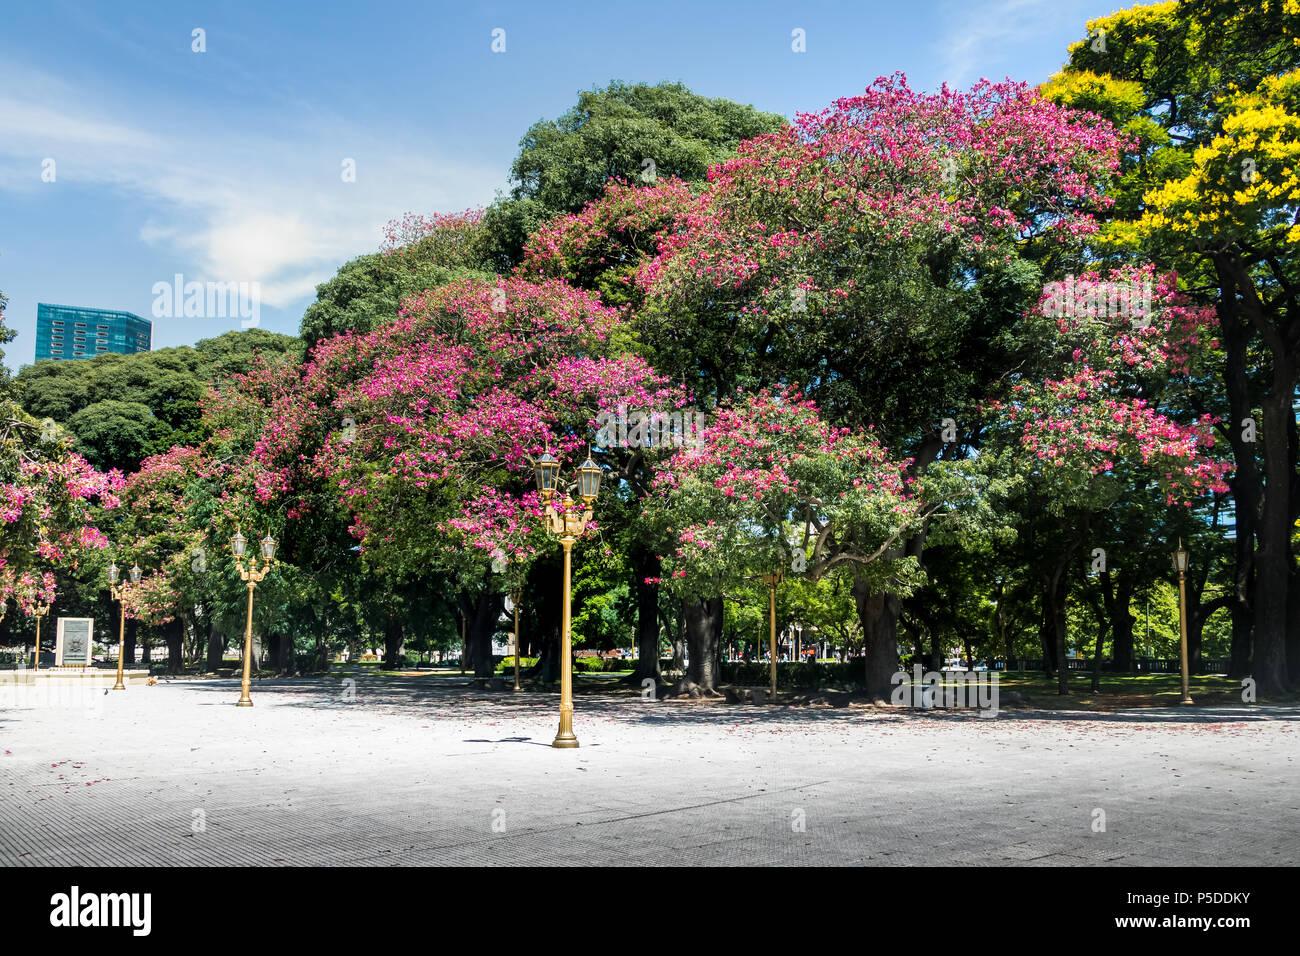 General San Martin Plaza in Retiro - Buenos Aires, Argentina - Stock Image